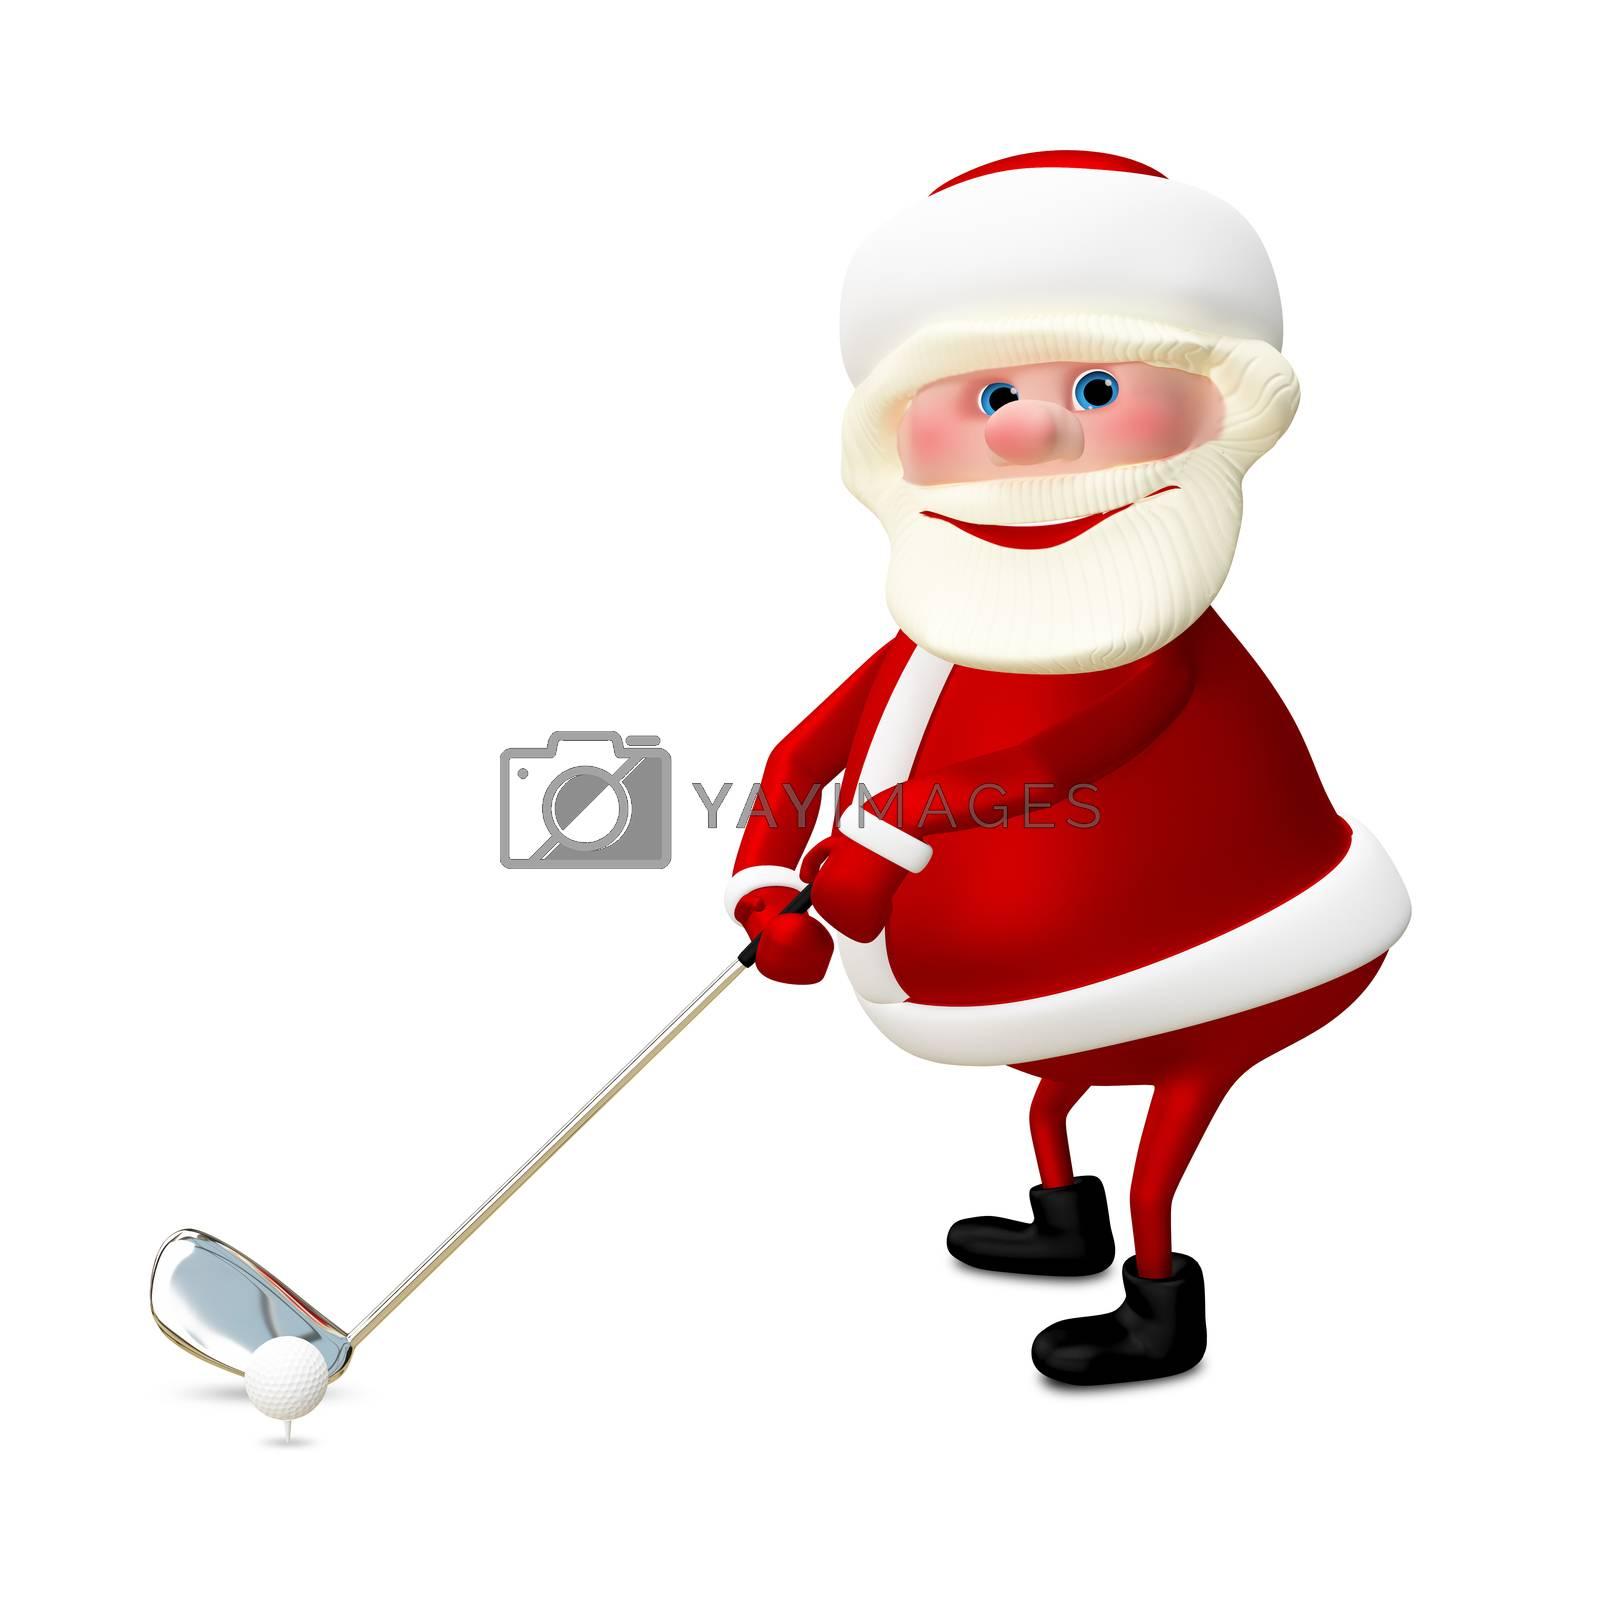 3D Illustration of Santa Claus Golfer on White Background